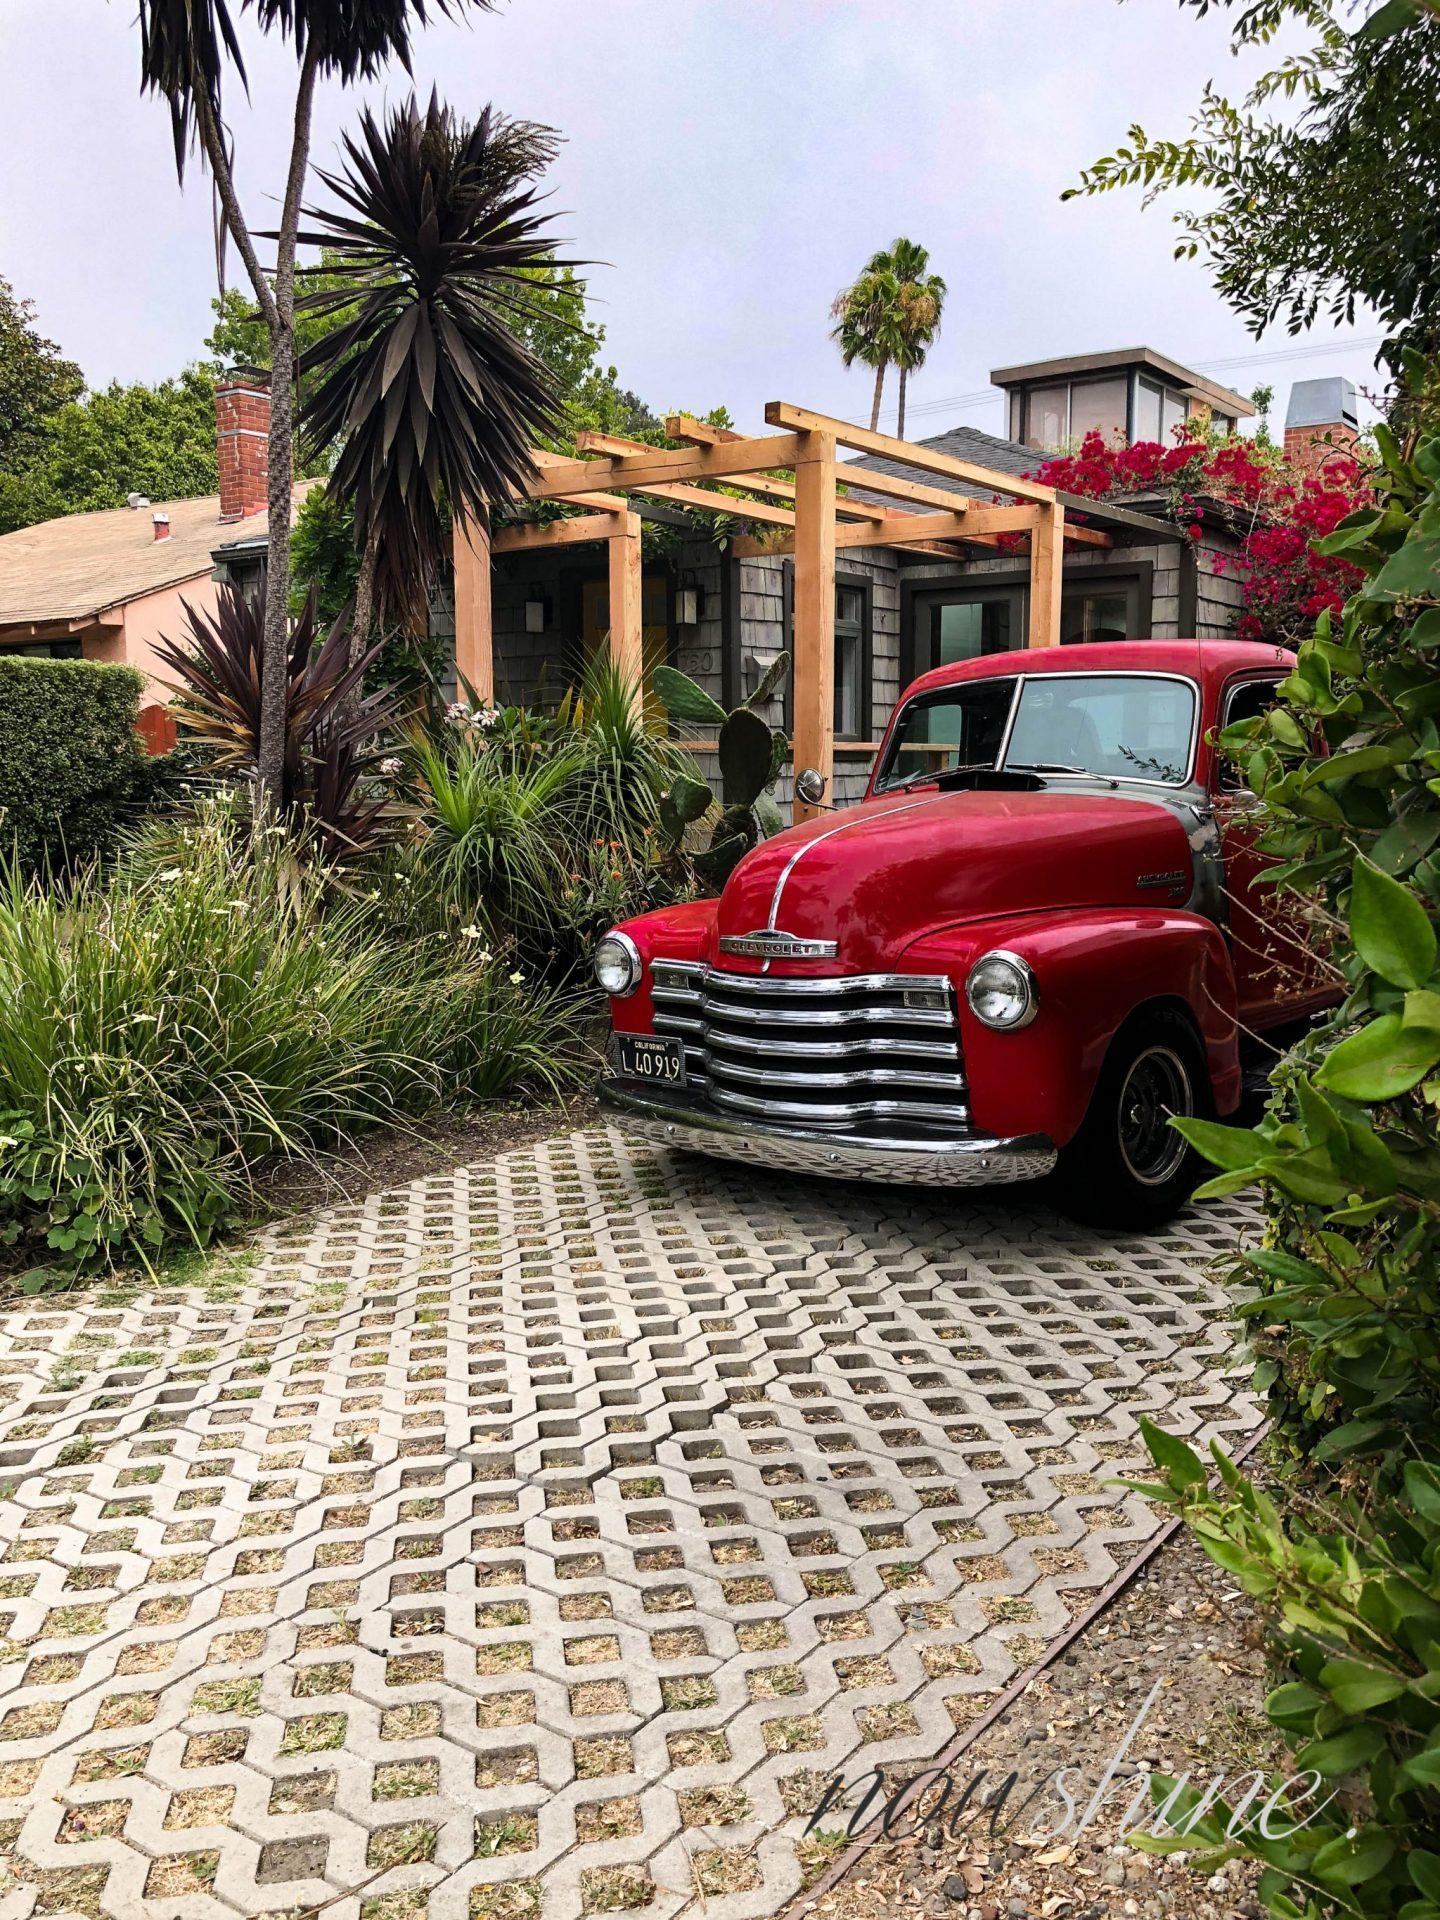 Venice Kalifornien - Nowshine ü 40 Reiseblog